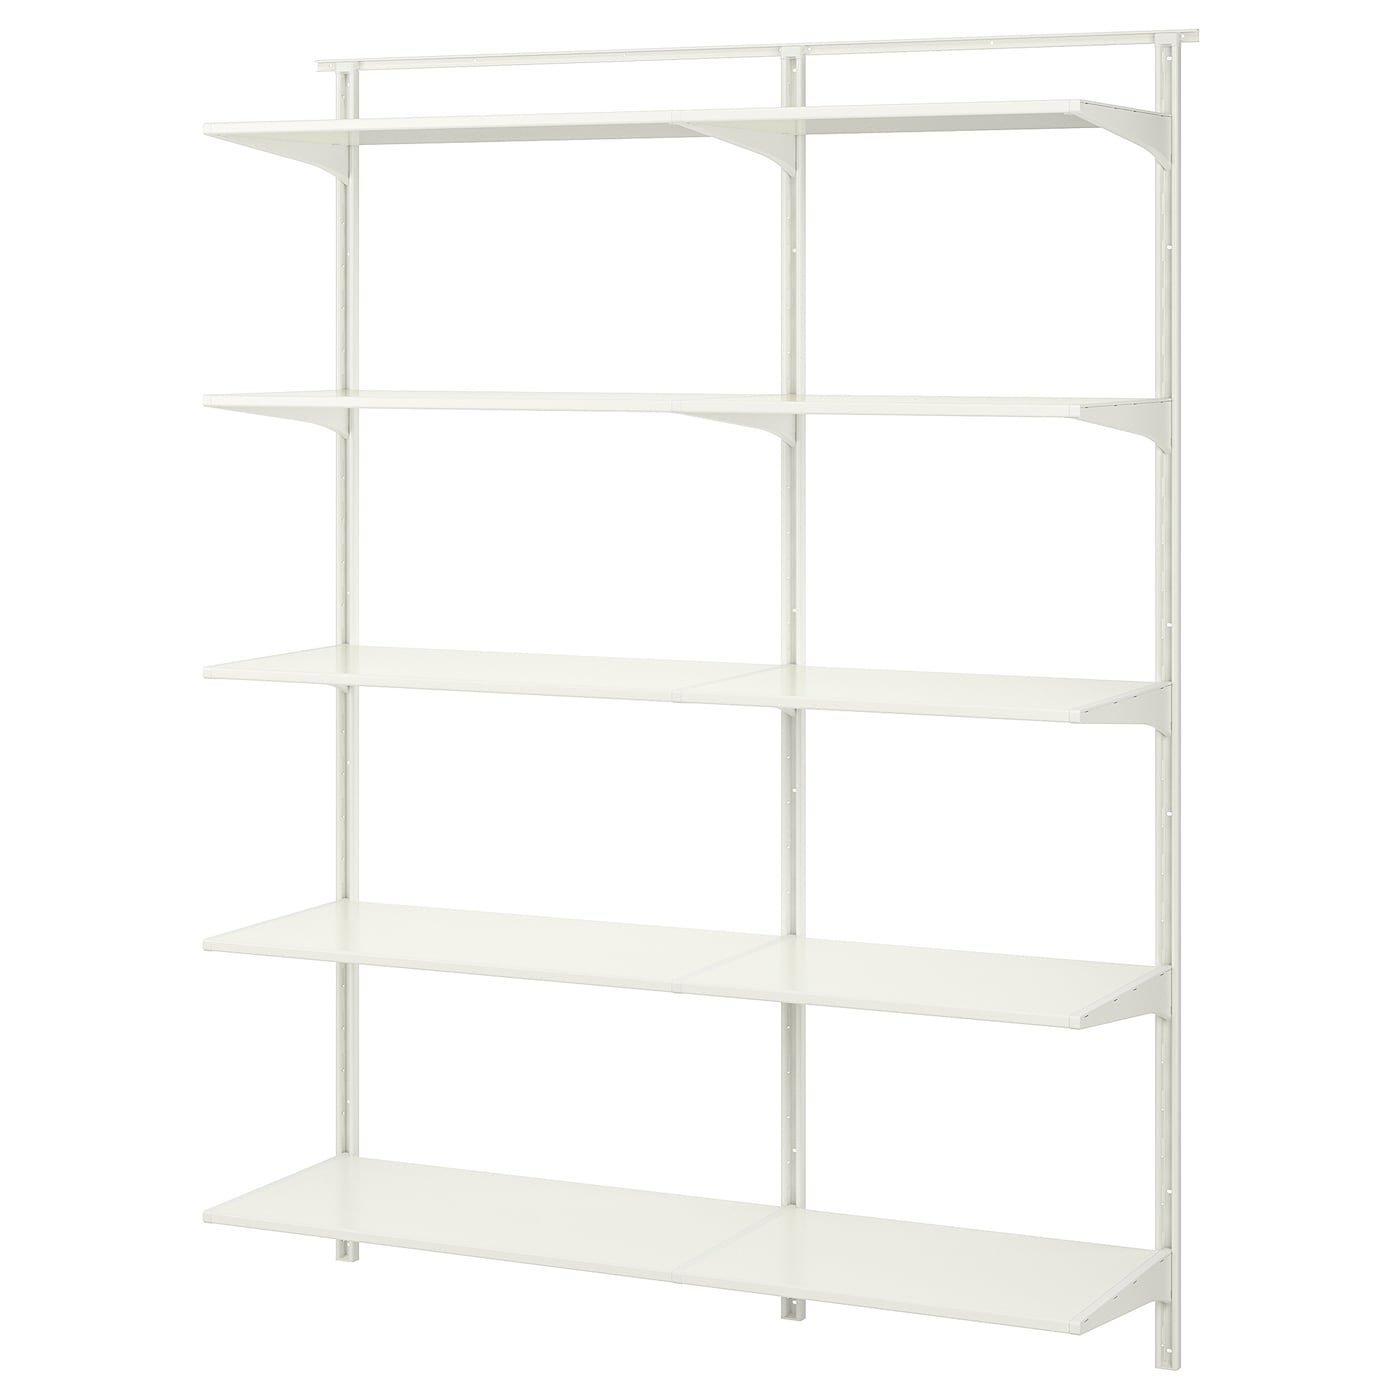 algot wall upright shelves white 154 x 40 x 196 cm ikea. Black Bedroom Furniture Sets. Home Design Ideas